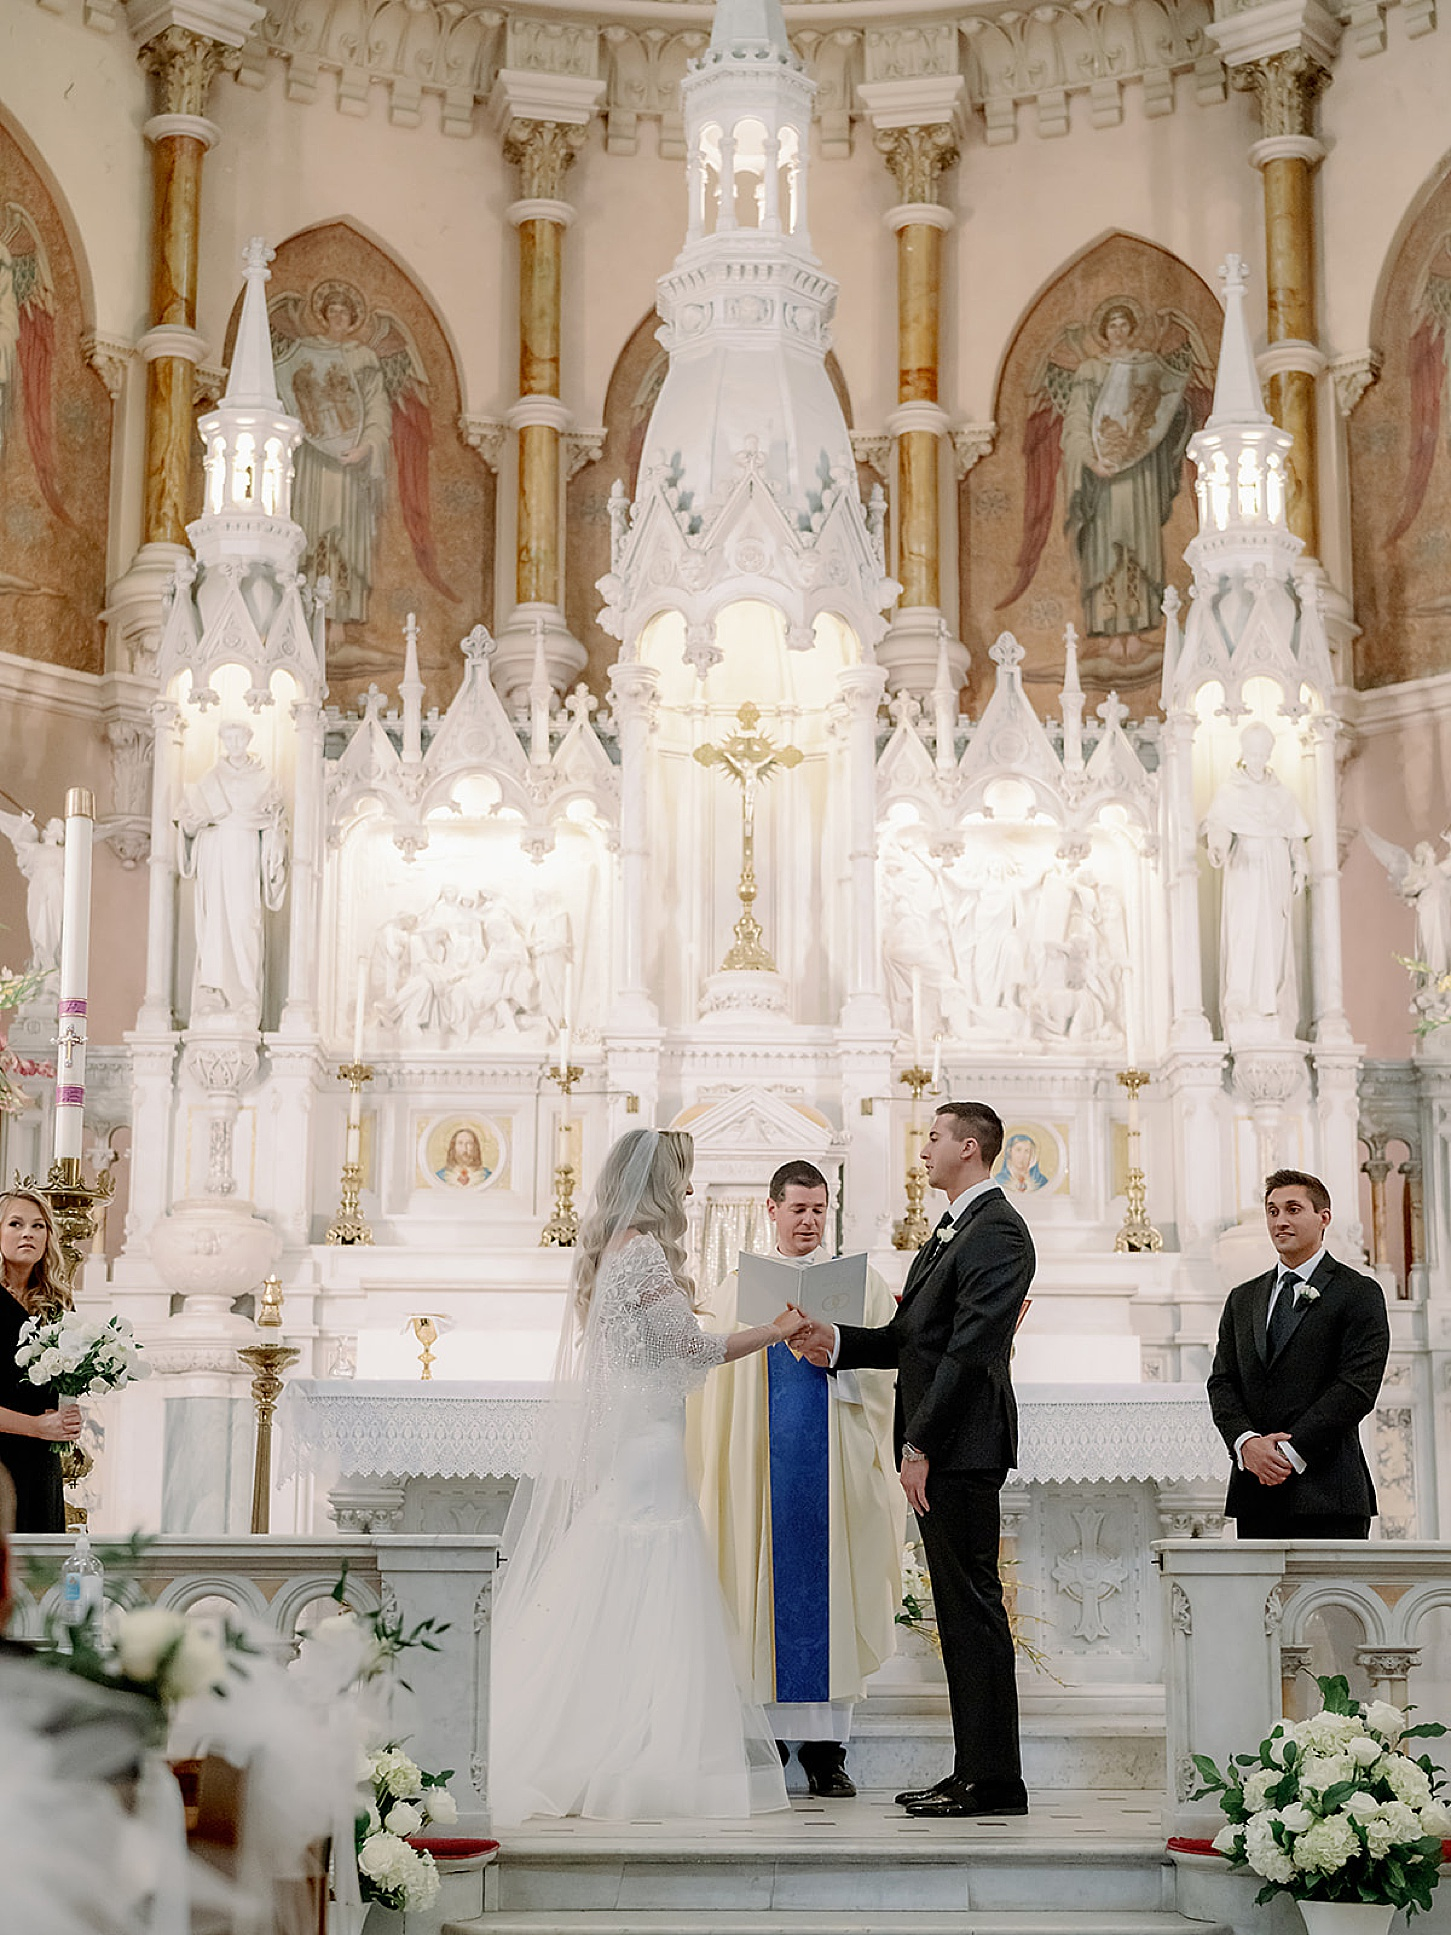 Atlantic City Wedding Photography Studio by Magdalena Studios Lexy Cha 0022